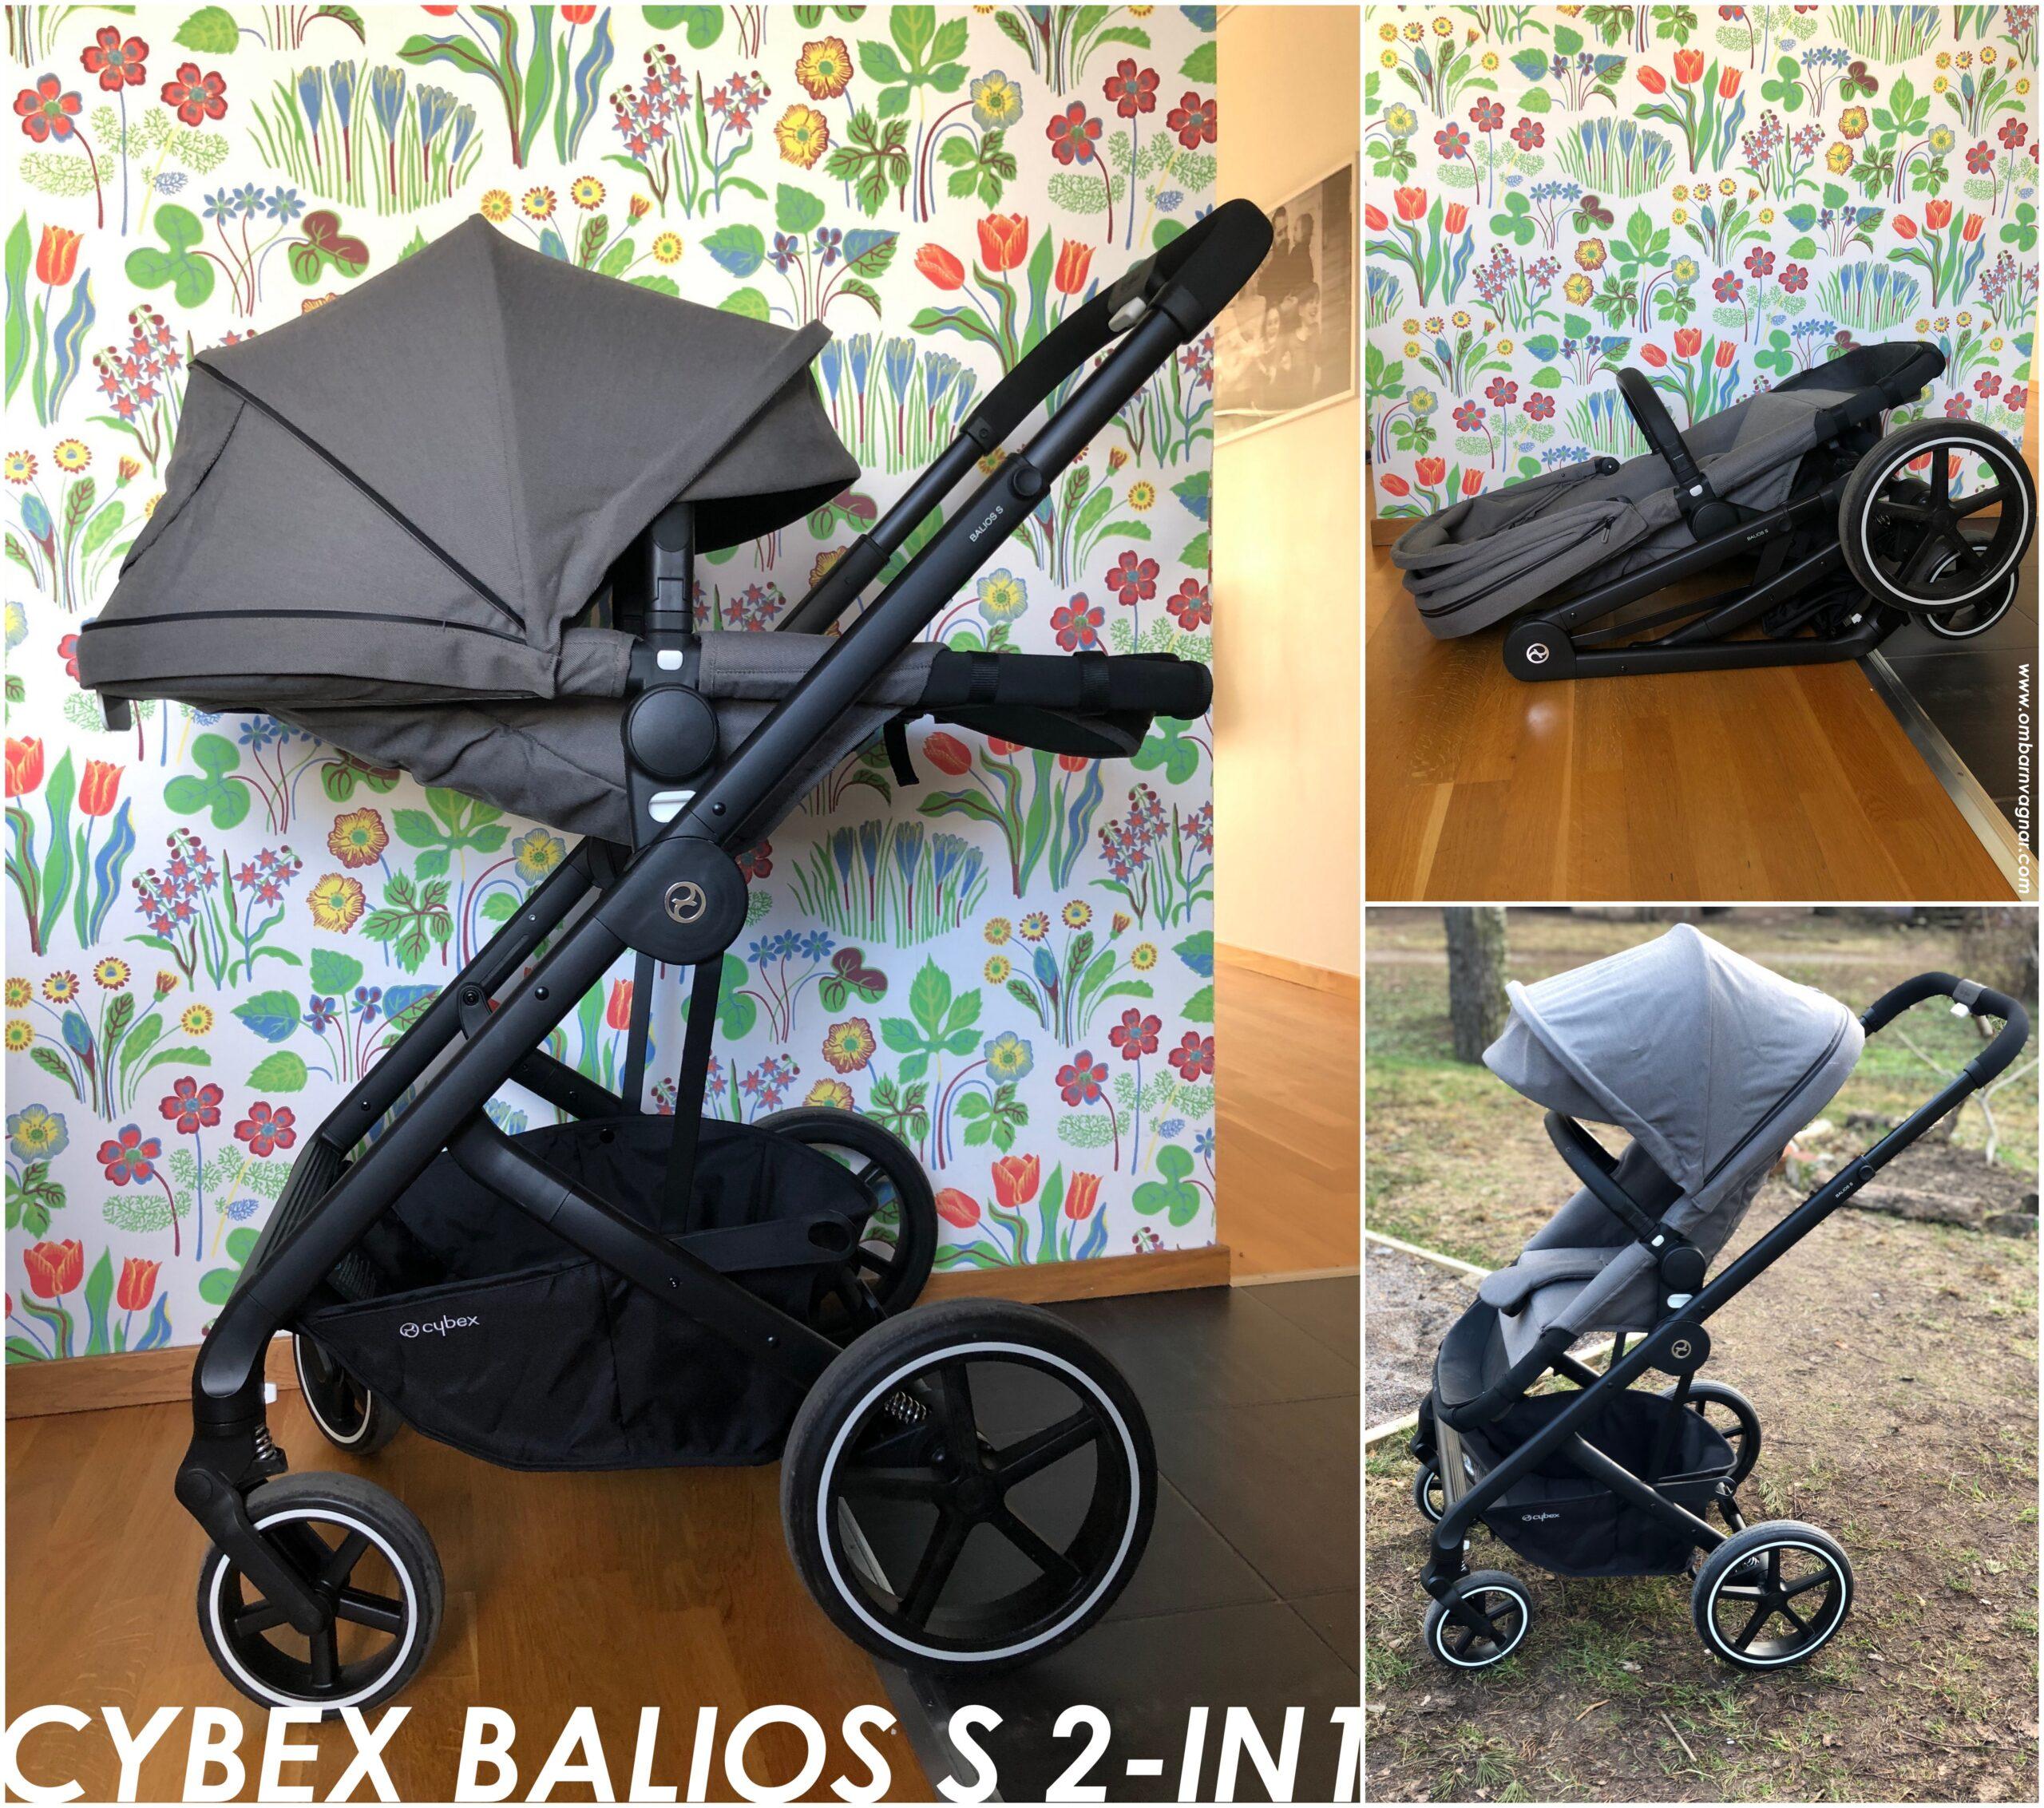 Recension av Cybex Balios S 2-in-1